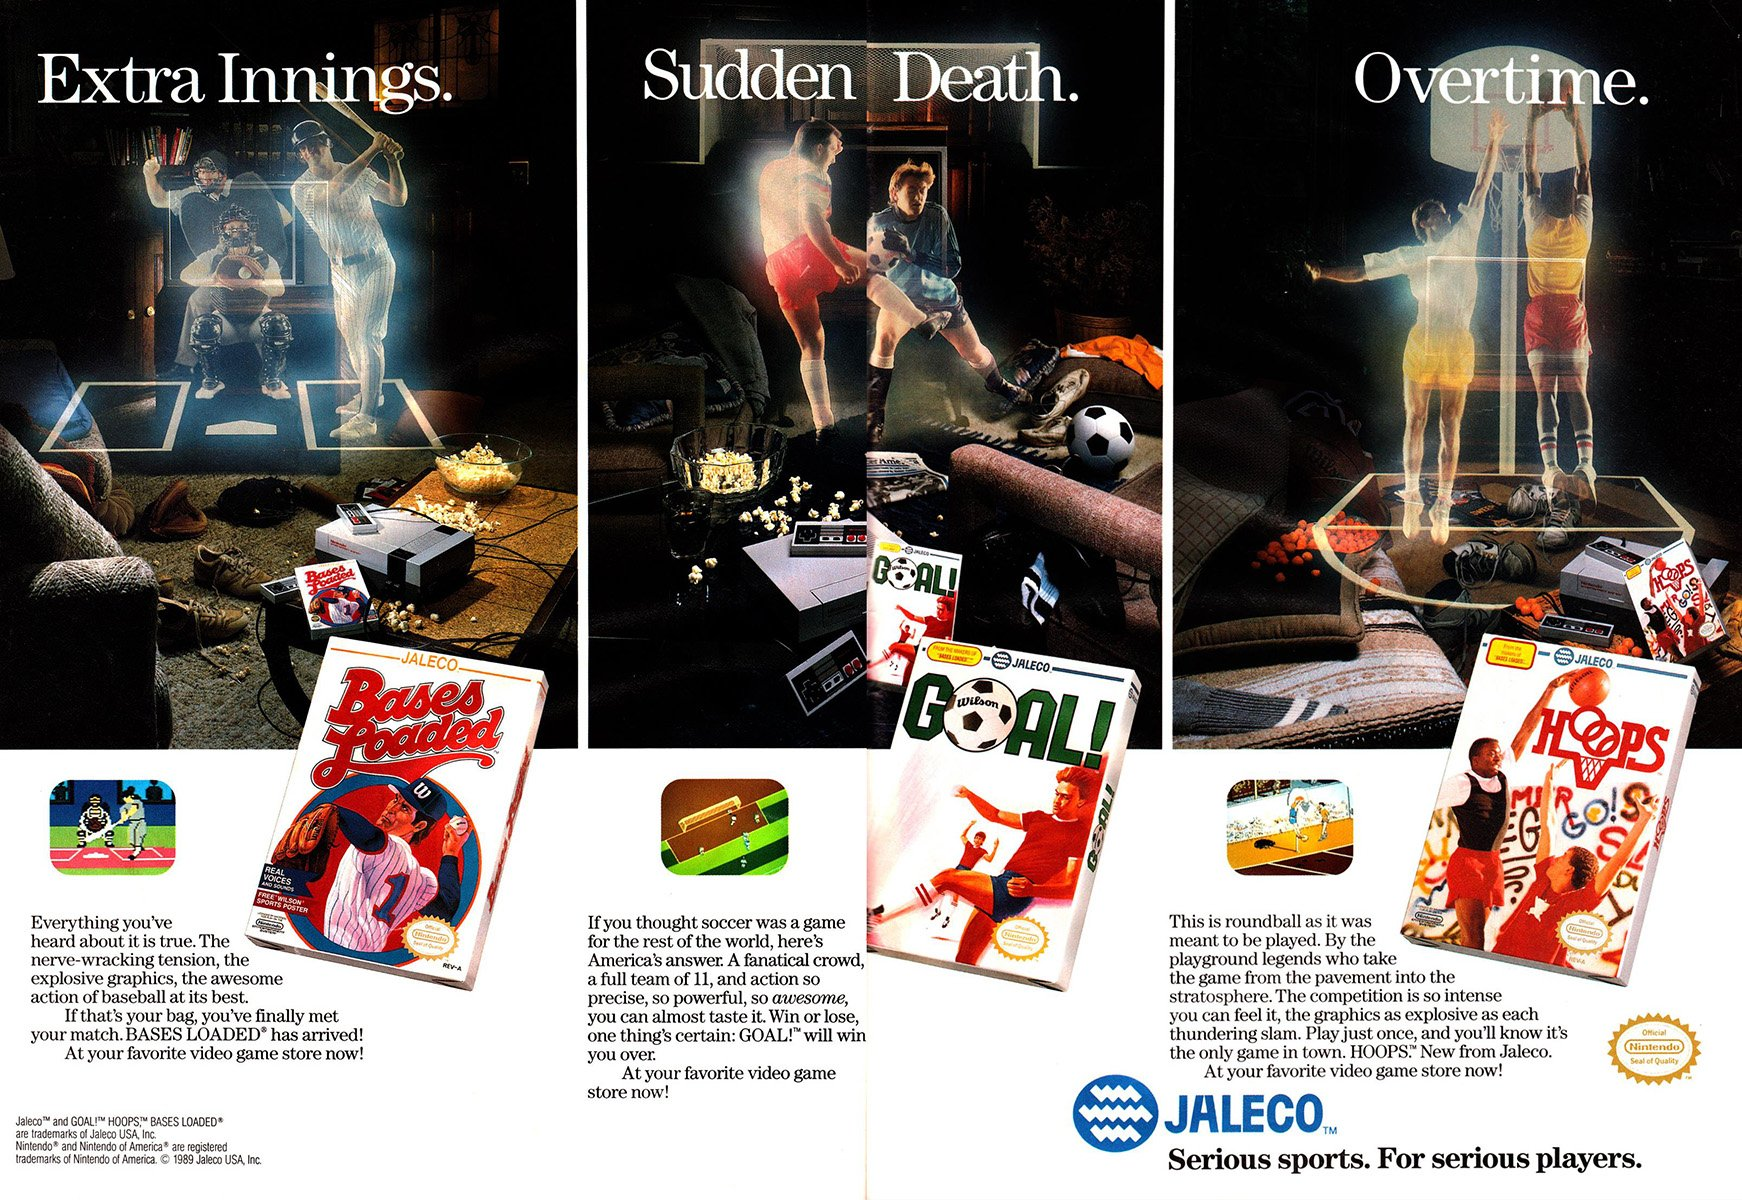 Jaleco sports multi-ad (1989)